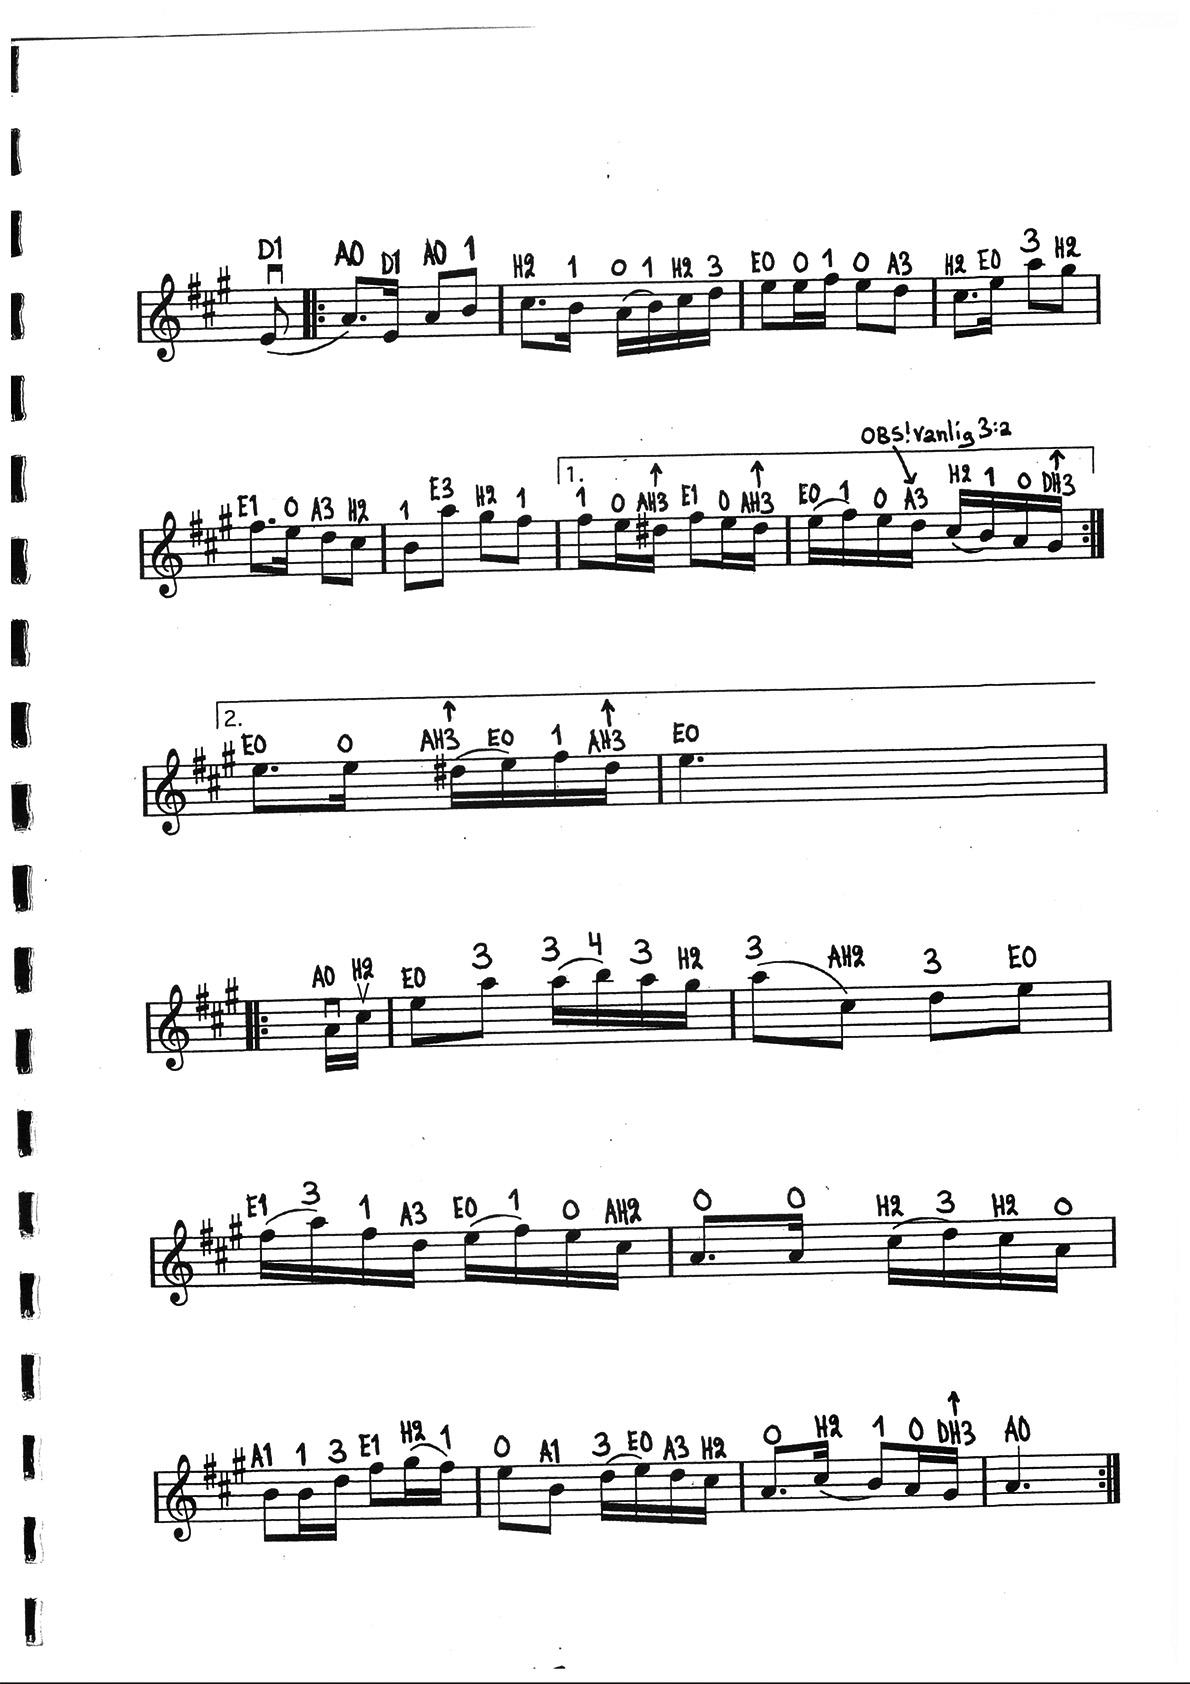 Solskenslåten - efter Anders Frisell/Trad. (sida 2)